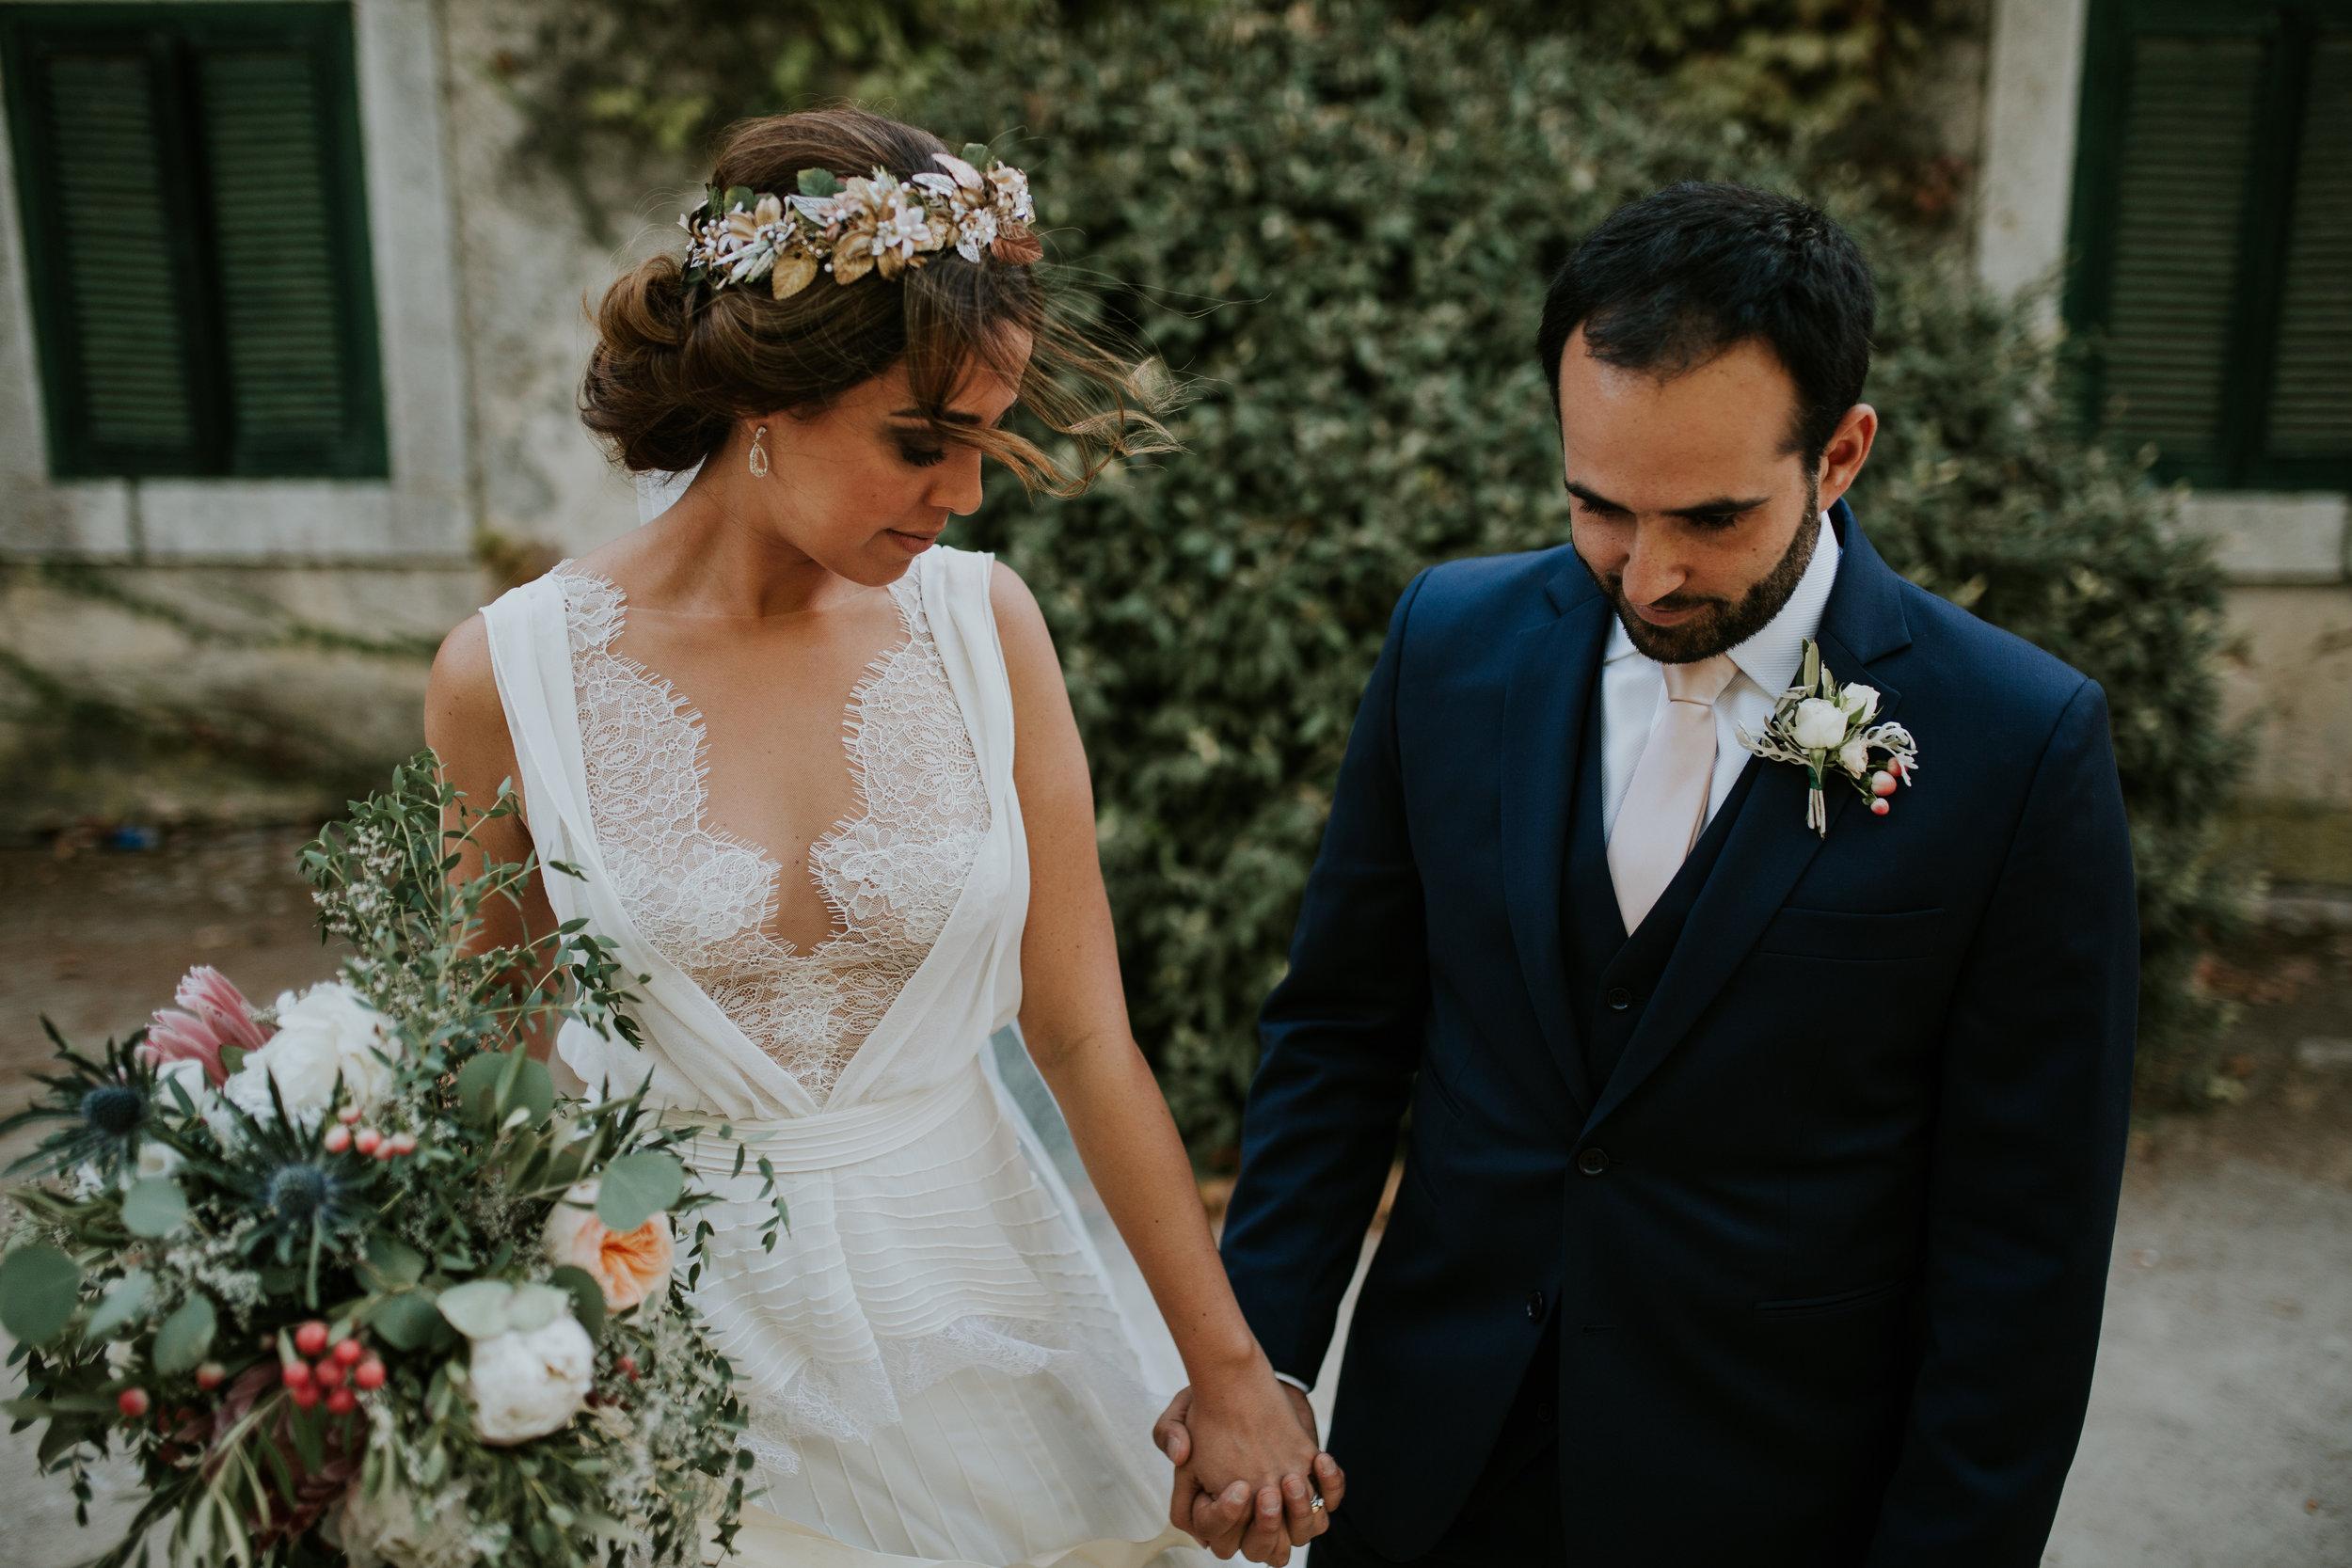 R&J411_ 09 setembro 2017 Wedding day_.jpg